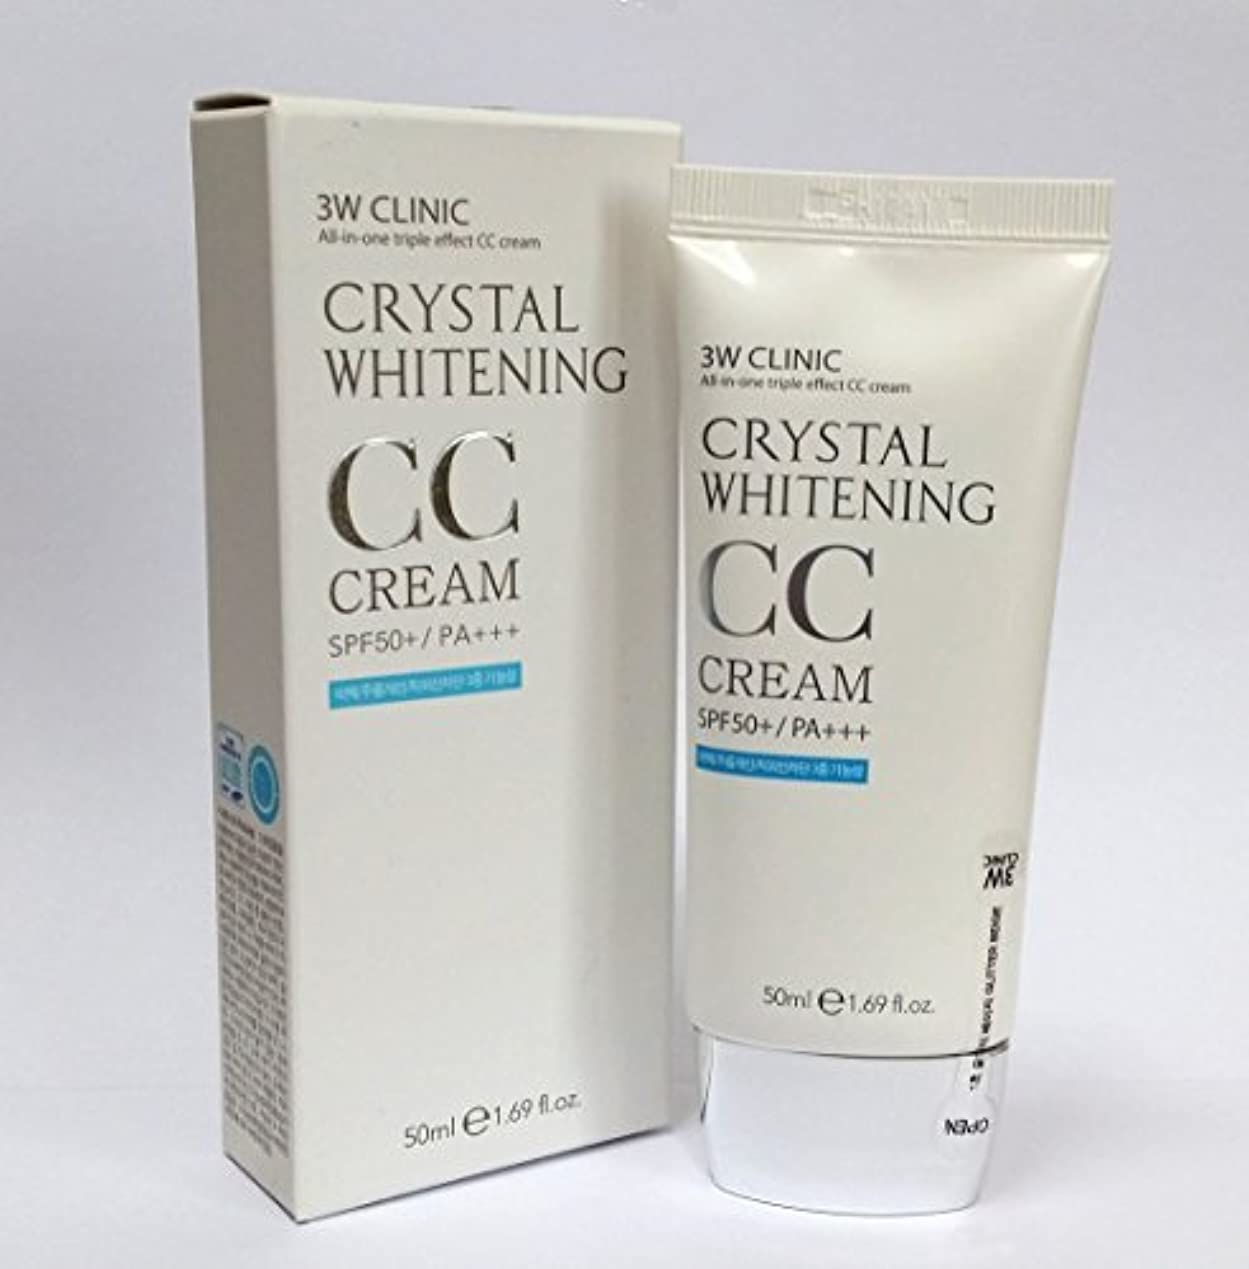 [3W CLINIC] クリスタルホワイトニングCCクリーム50ml SPF50 PA +++ / #01 Glitter Beige/Crystal Whitening CC Cream 50ml SPF50 PA++...